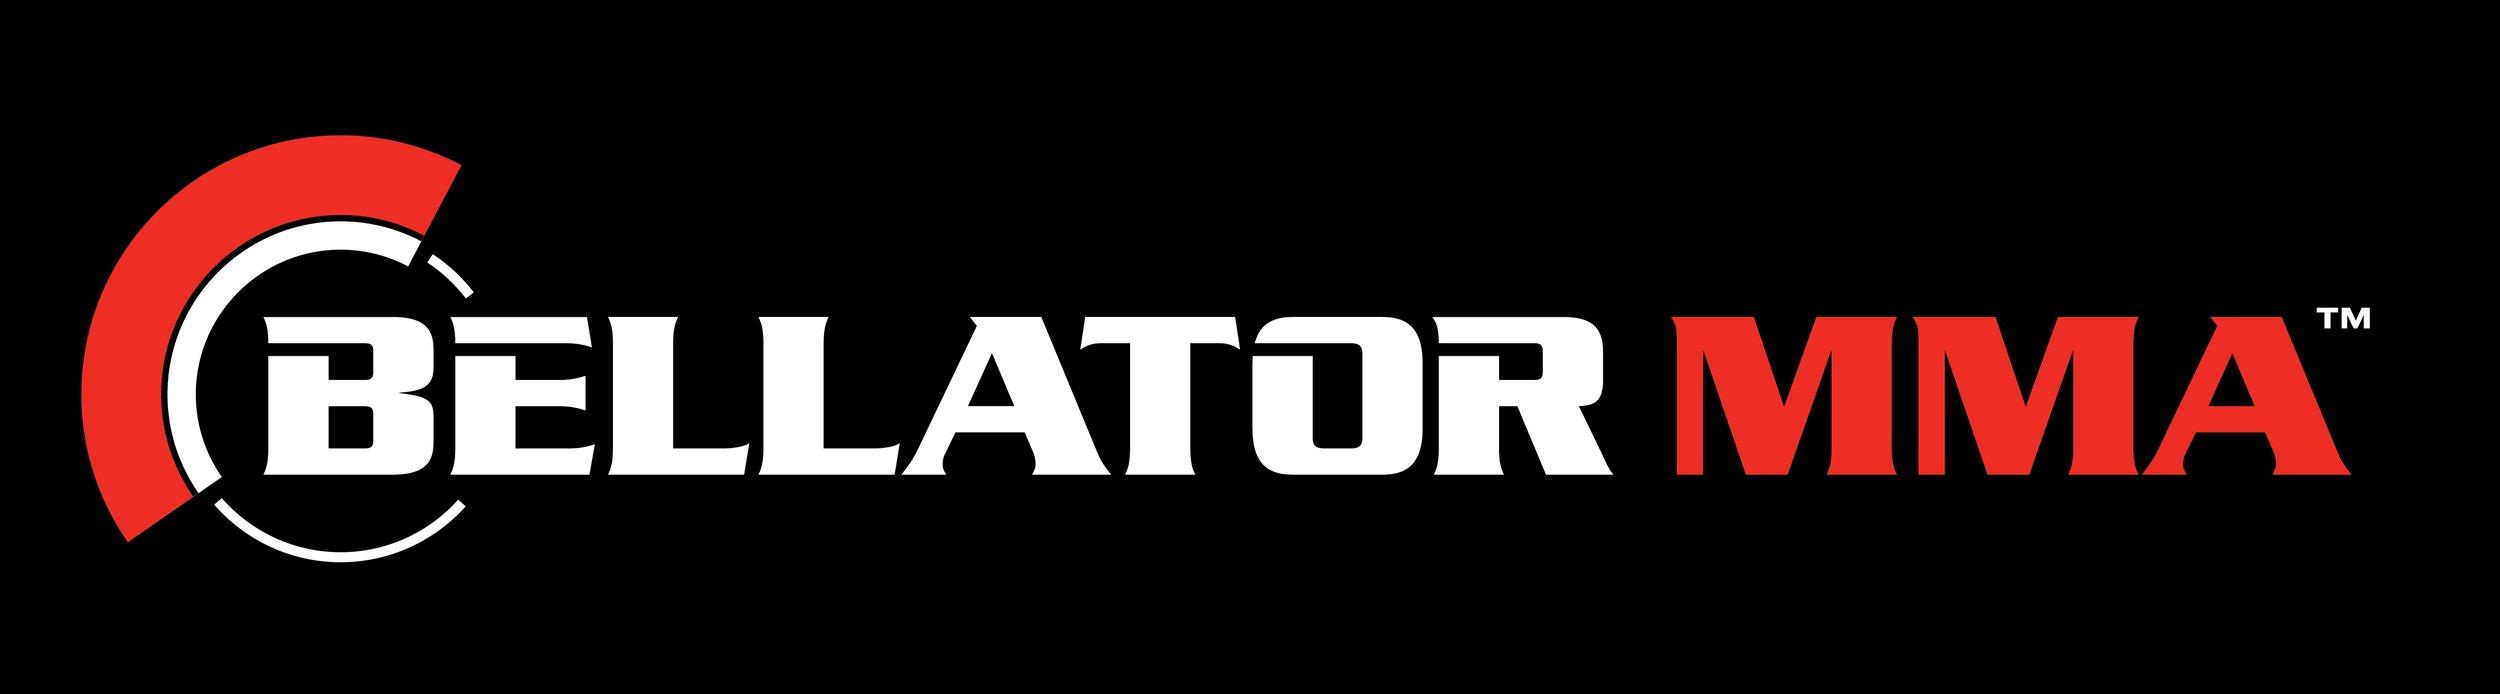 bellator-logo (1).jpg